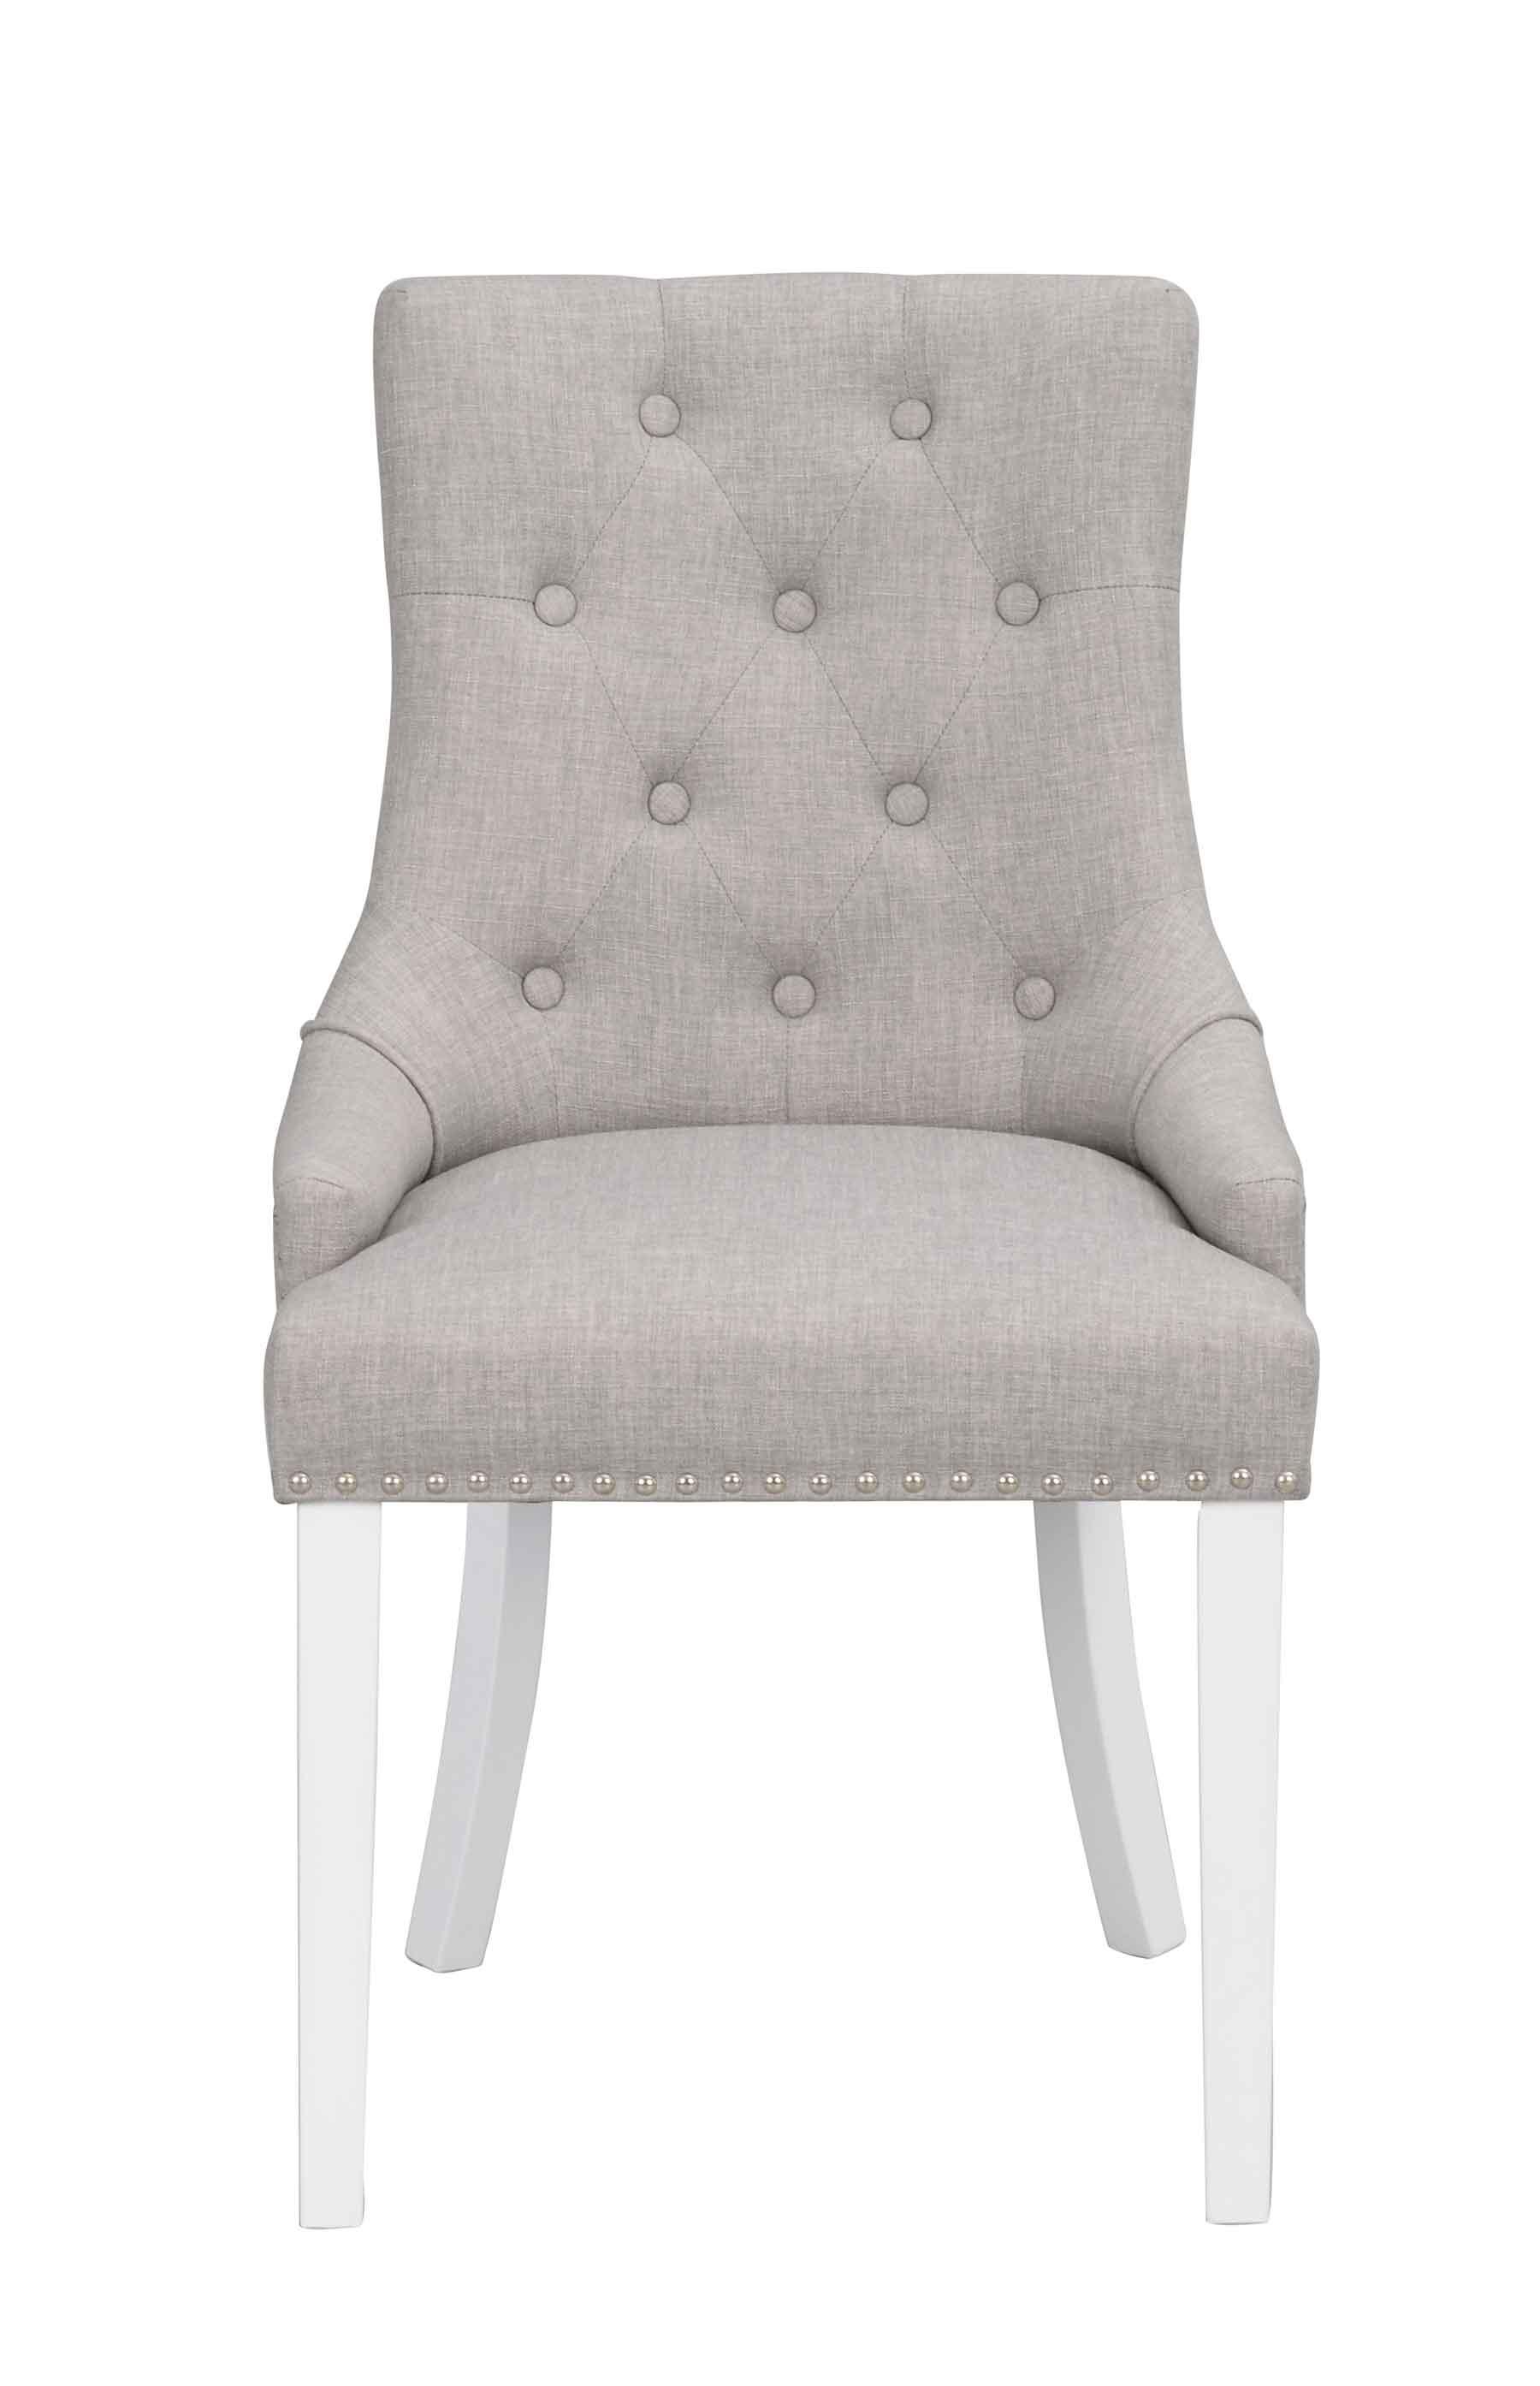 ROWICO Vicky spisebordsstol - lysegråt stof/hvide træben